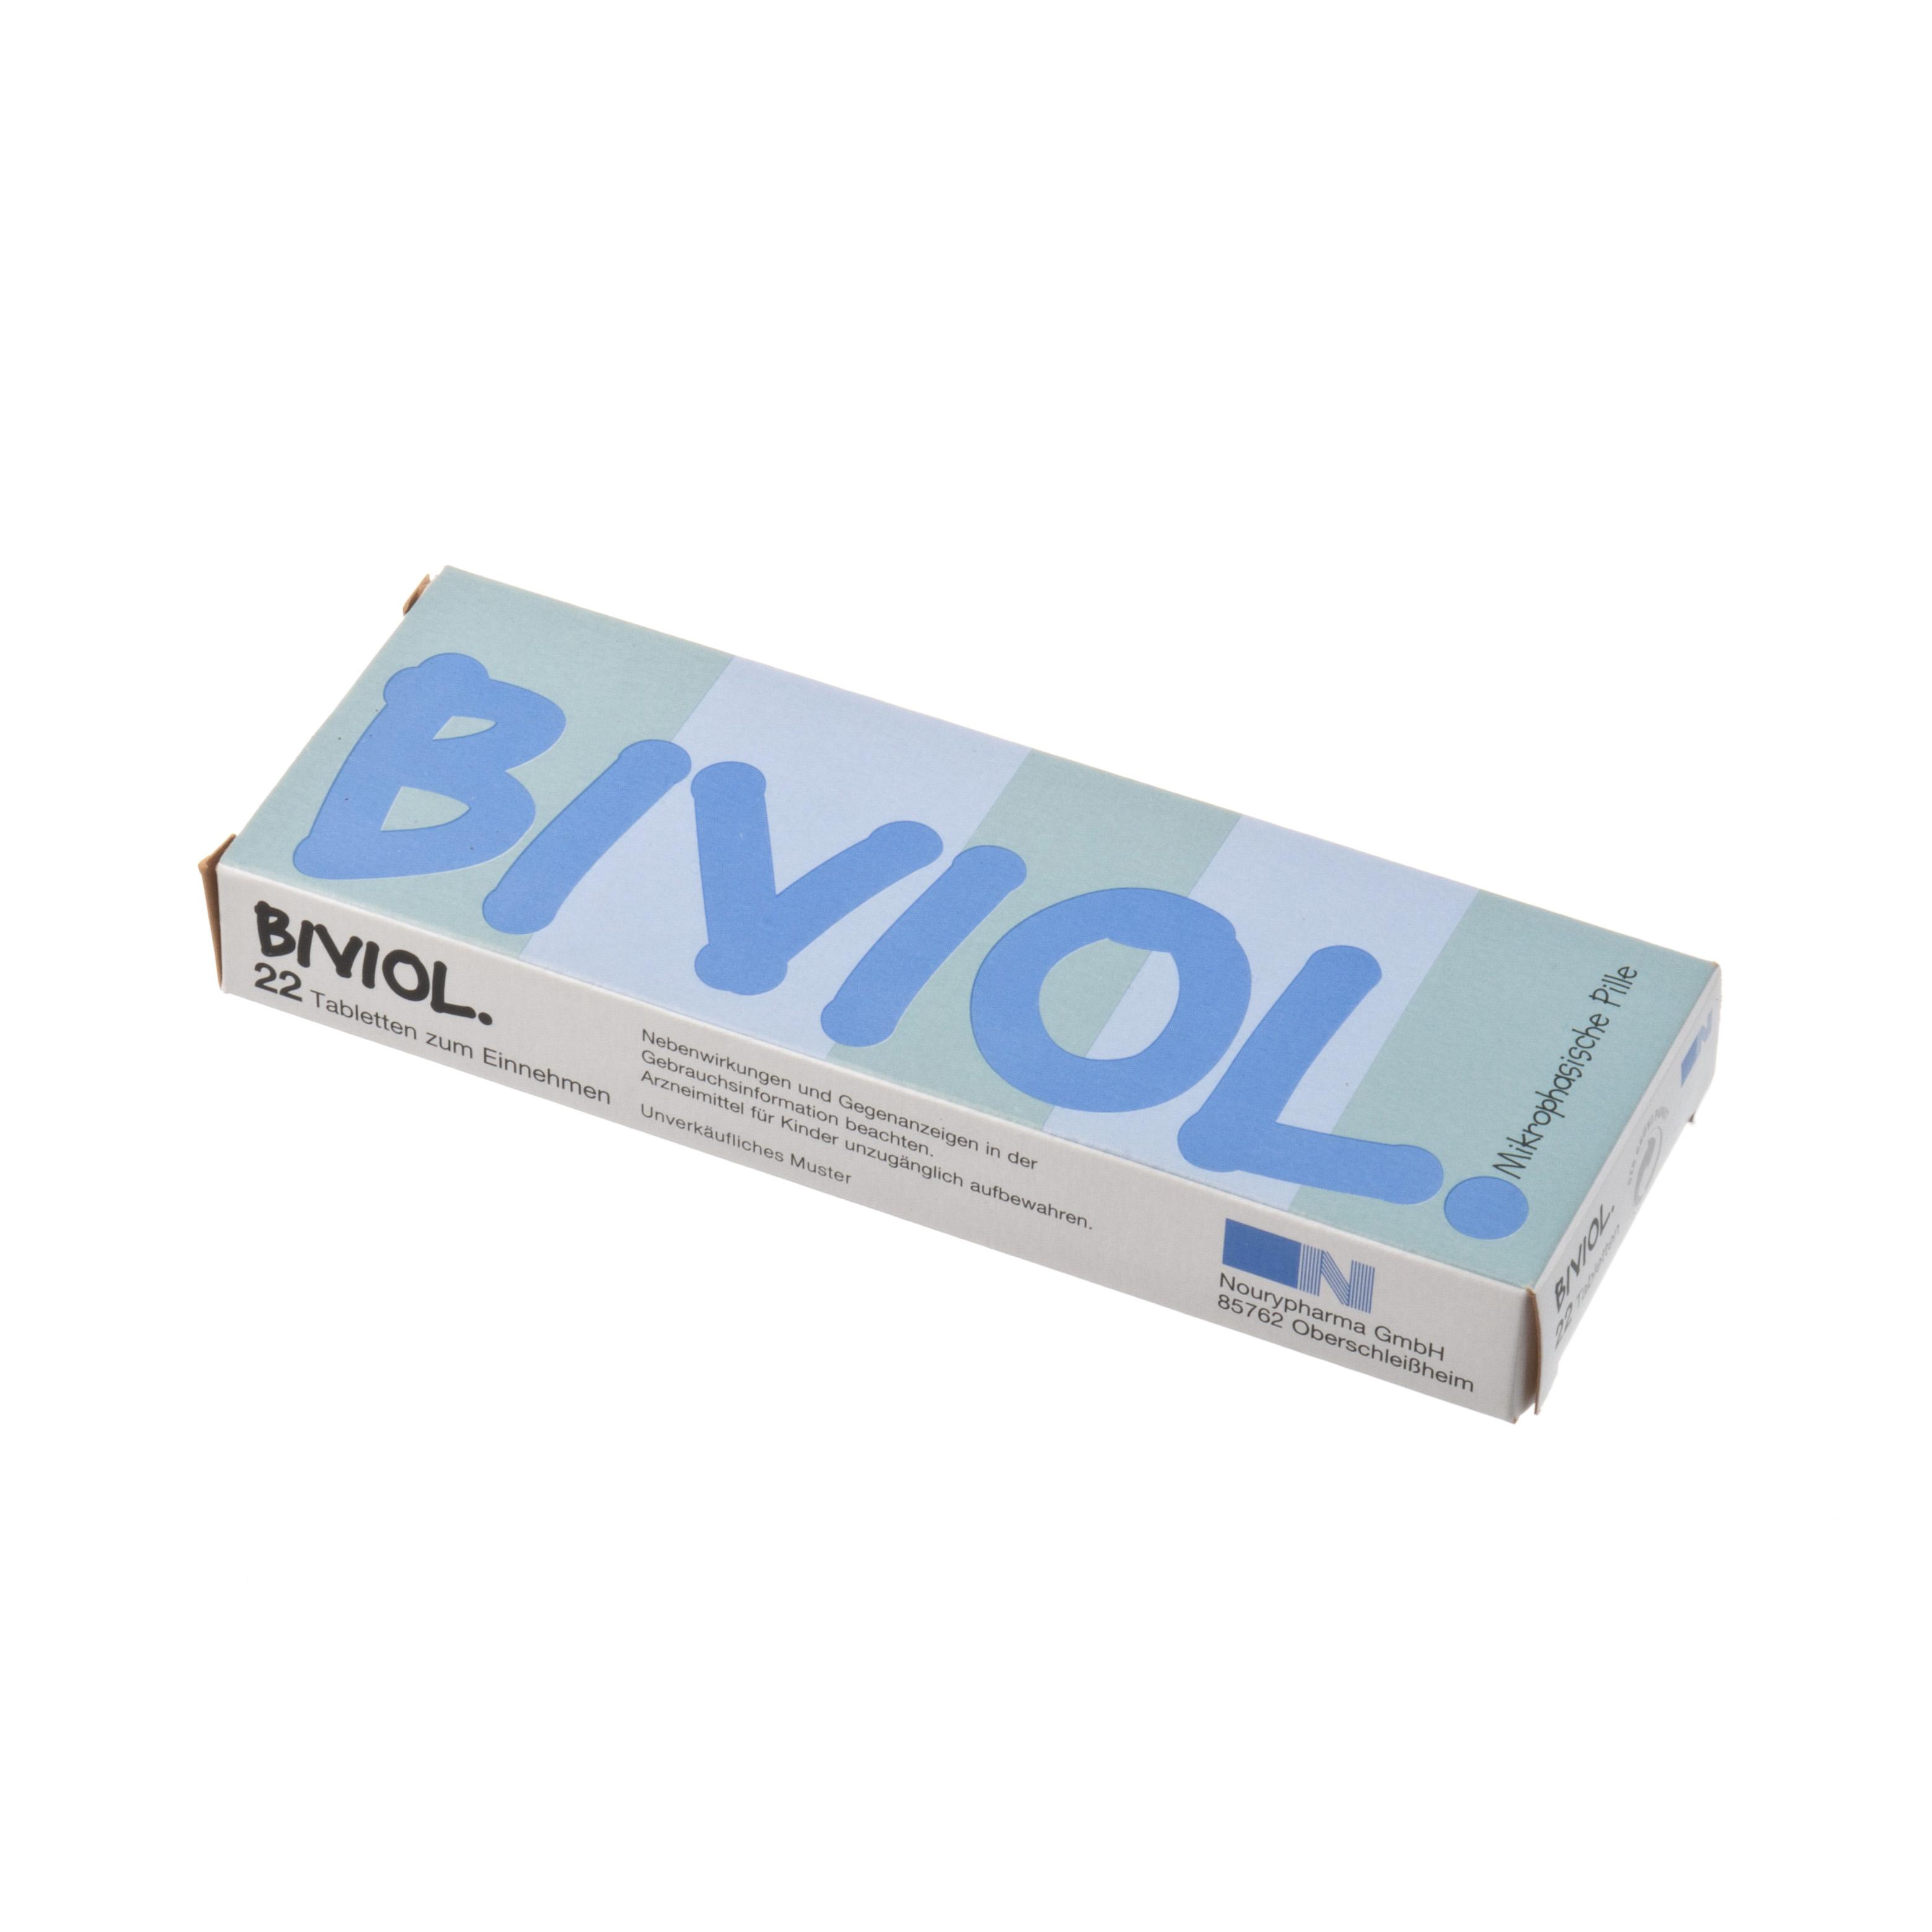 chariva pille nebenwirkungen